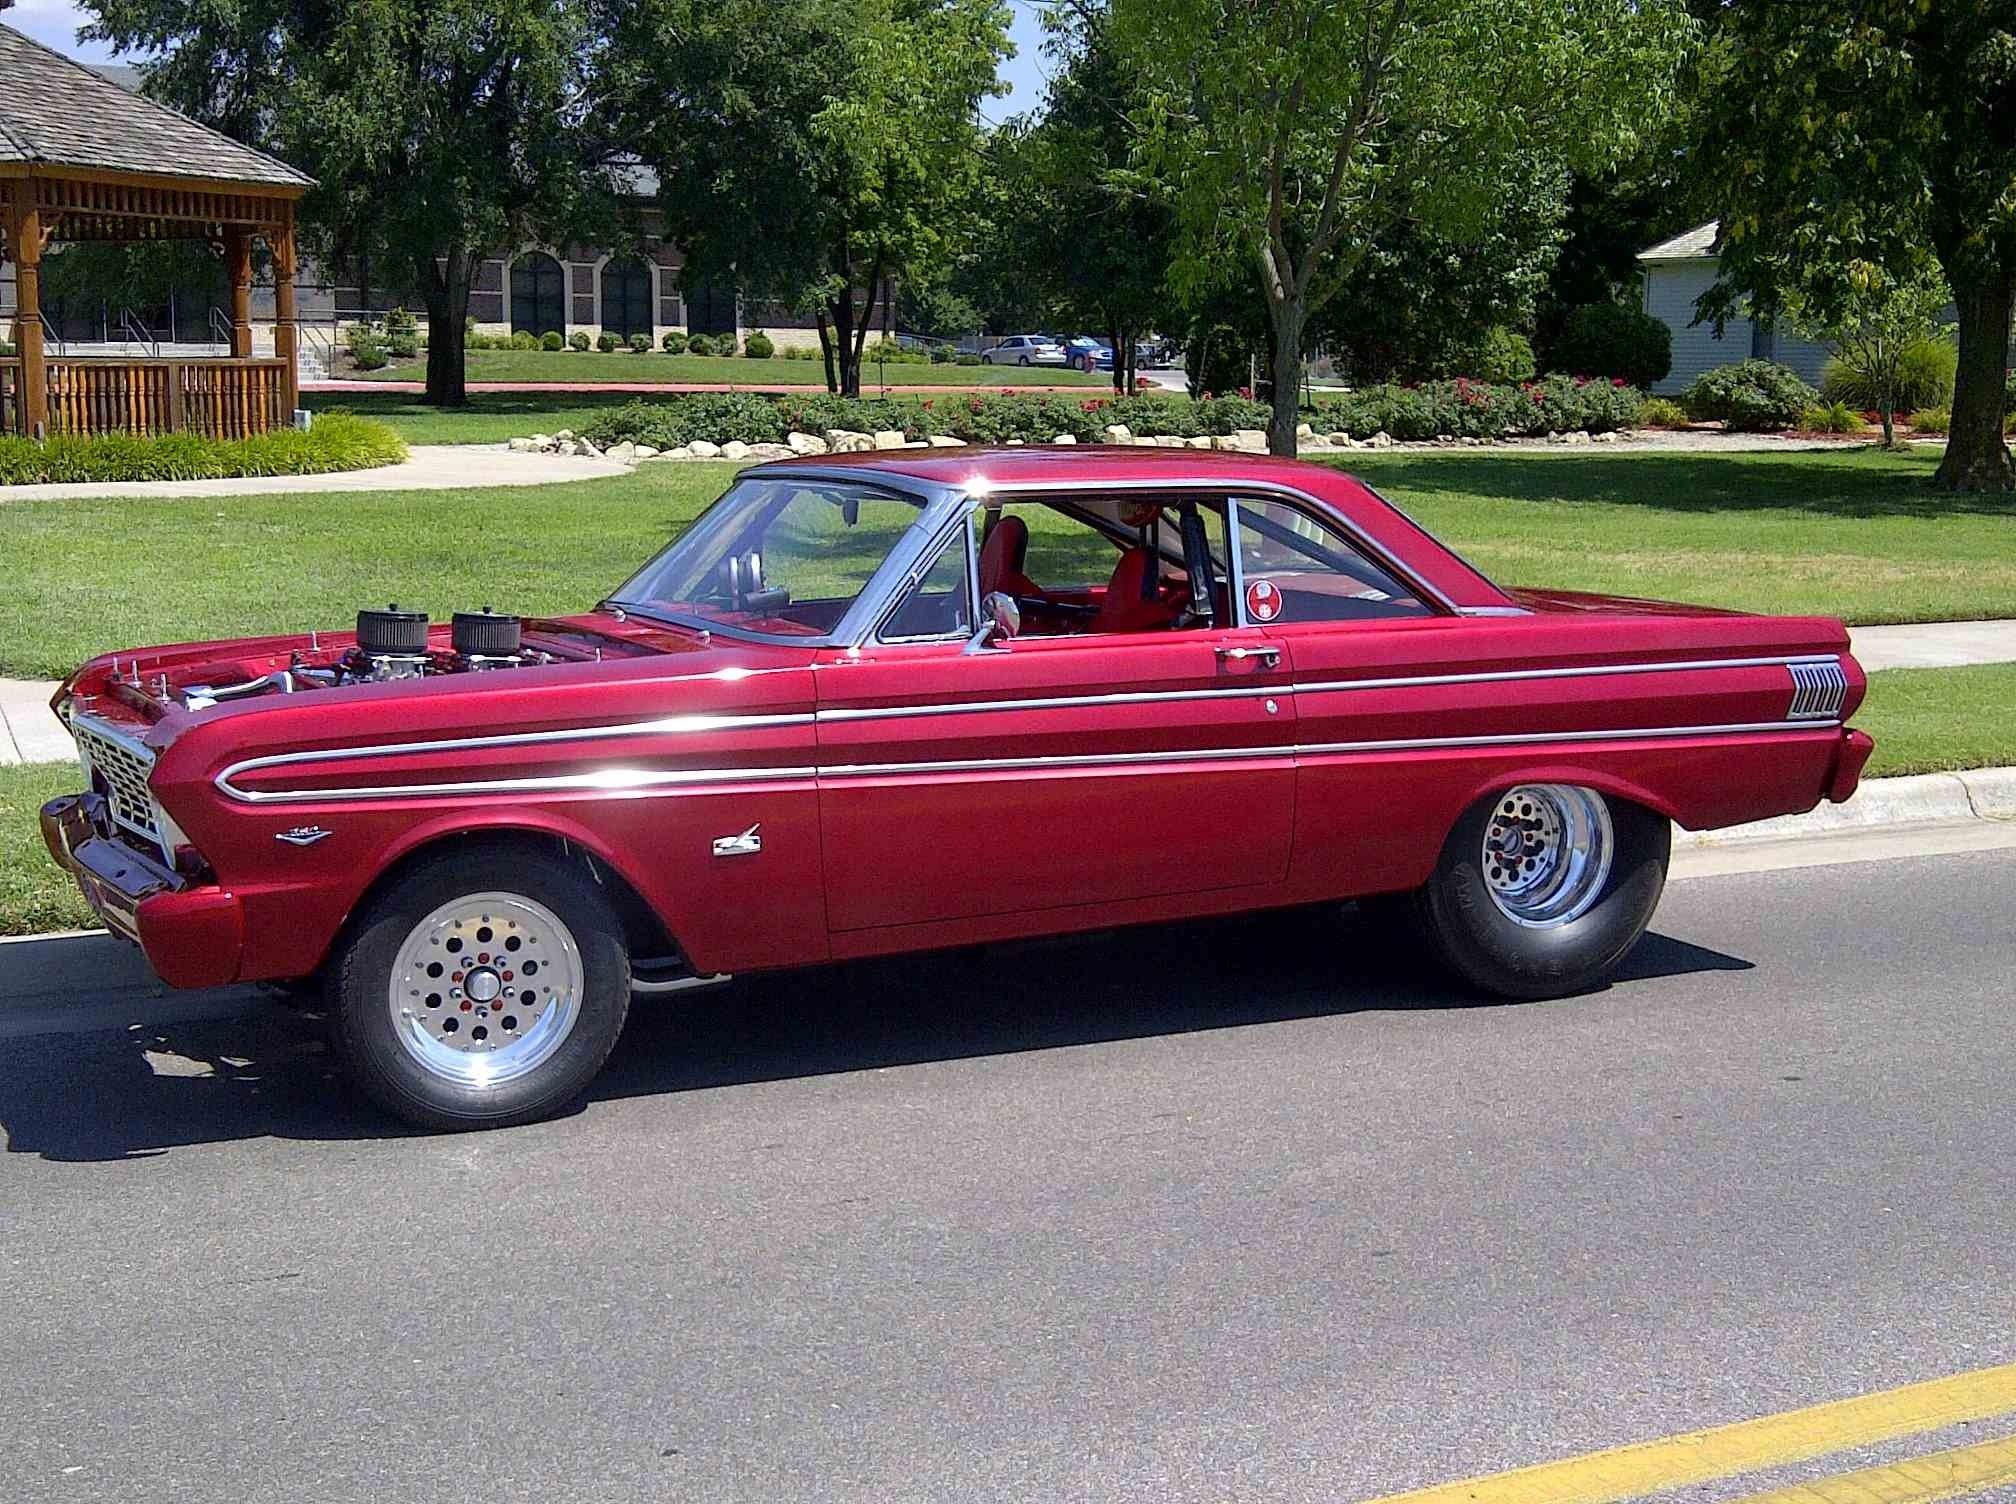 1963 ford falcon futura sprint classic hot rod rods